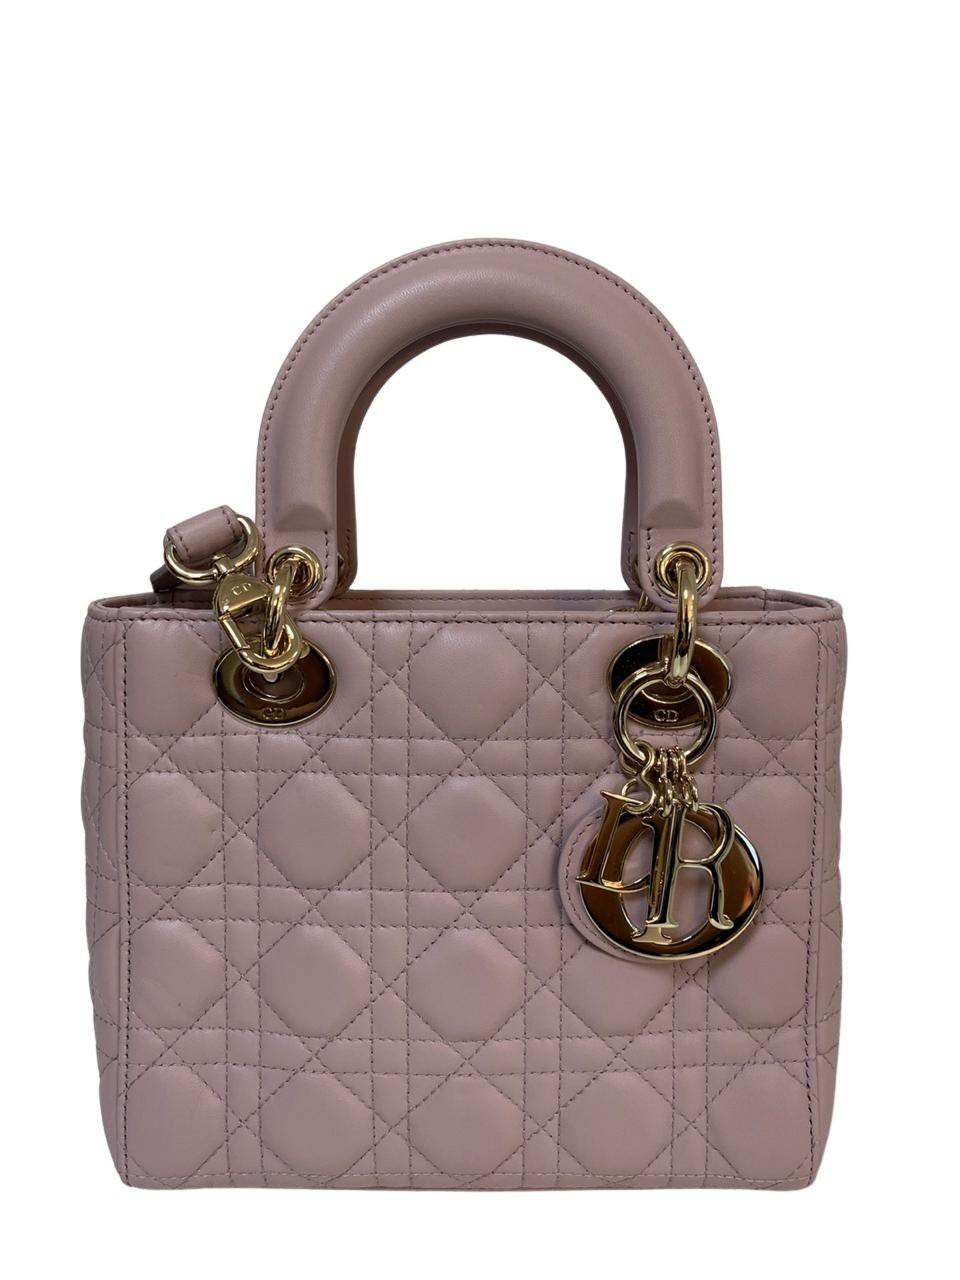 Bolsa Lady Dior Rosa Bebê